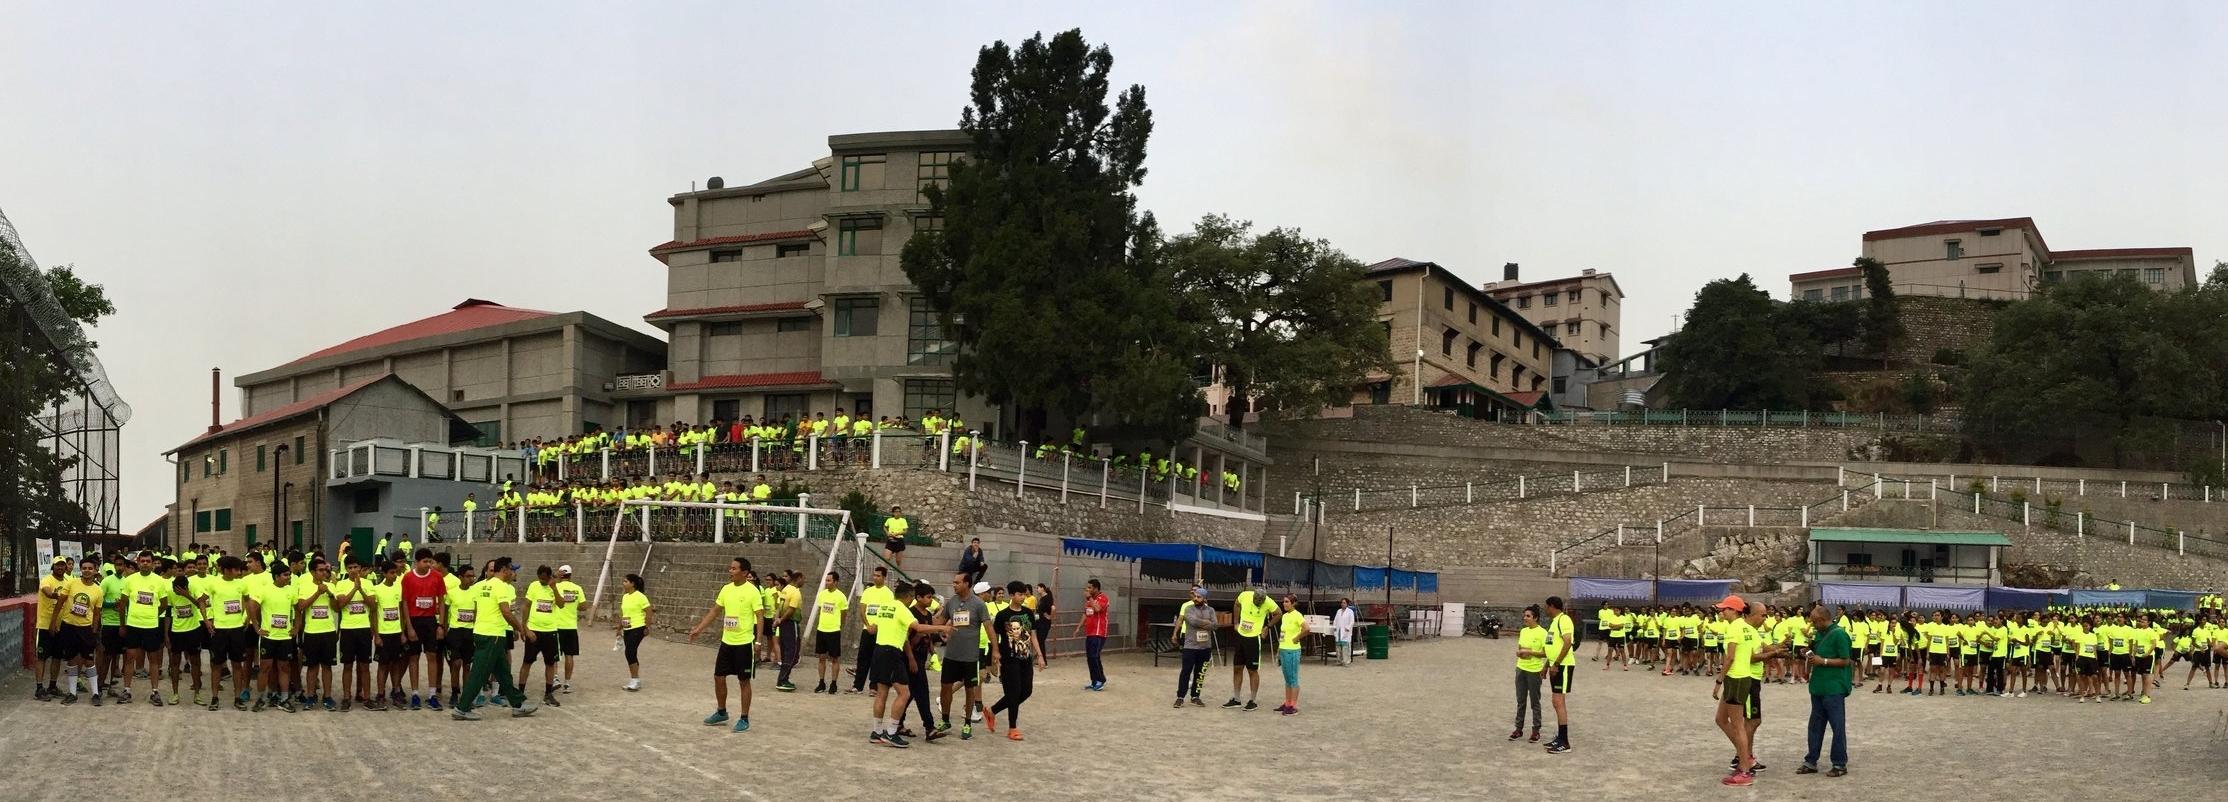 Before the start of 2017 edition of Wynberg-Allen School Half Marathon (5km, 10km & 21km) at Allen flats, Mussoorie.